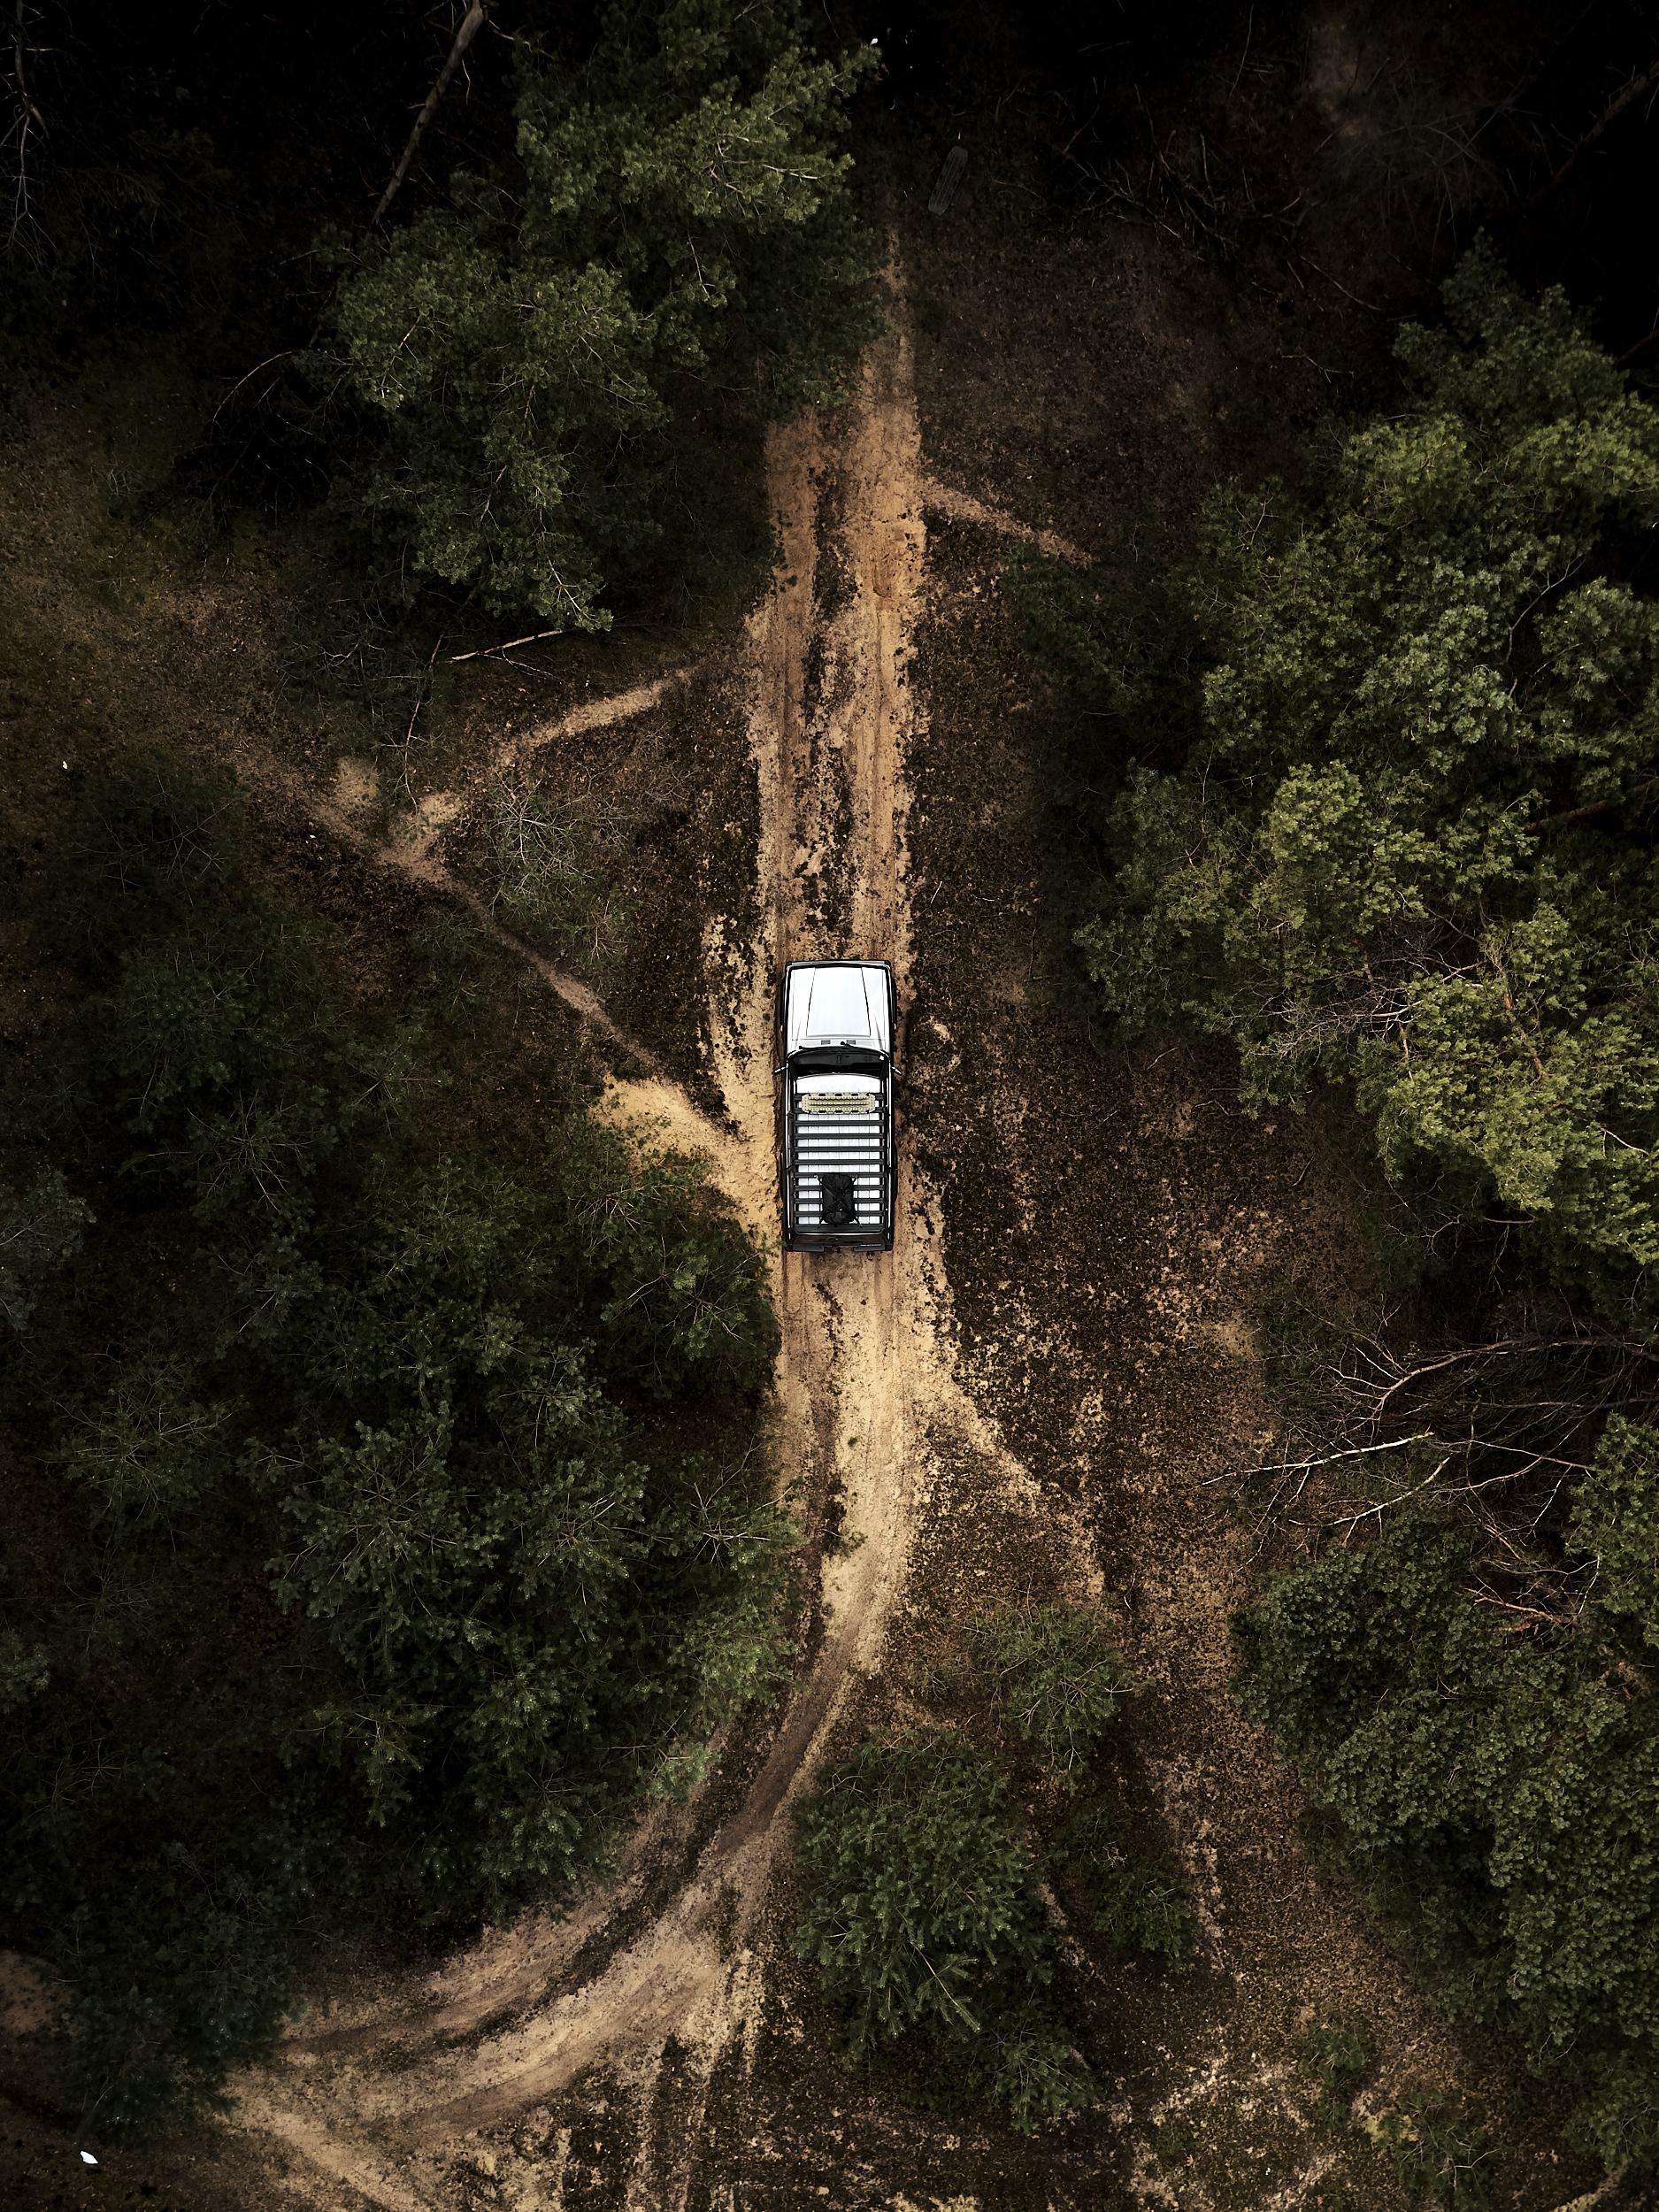 MARTINRUPIK_Toyota_LC_Front-Runner_by_Georg-Roske_DJI_0451